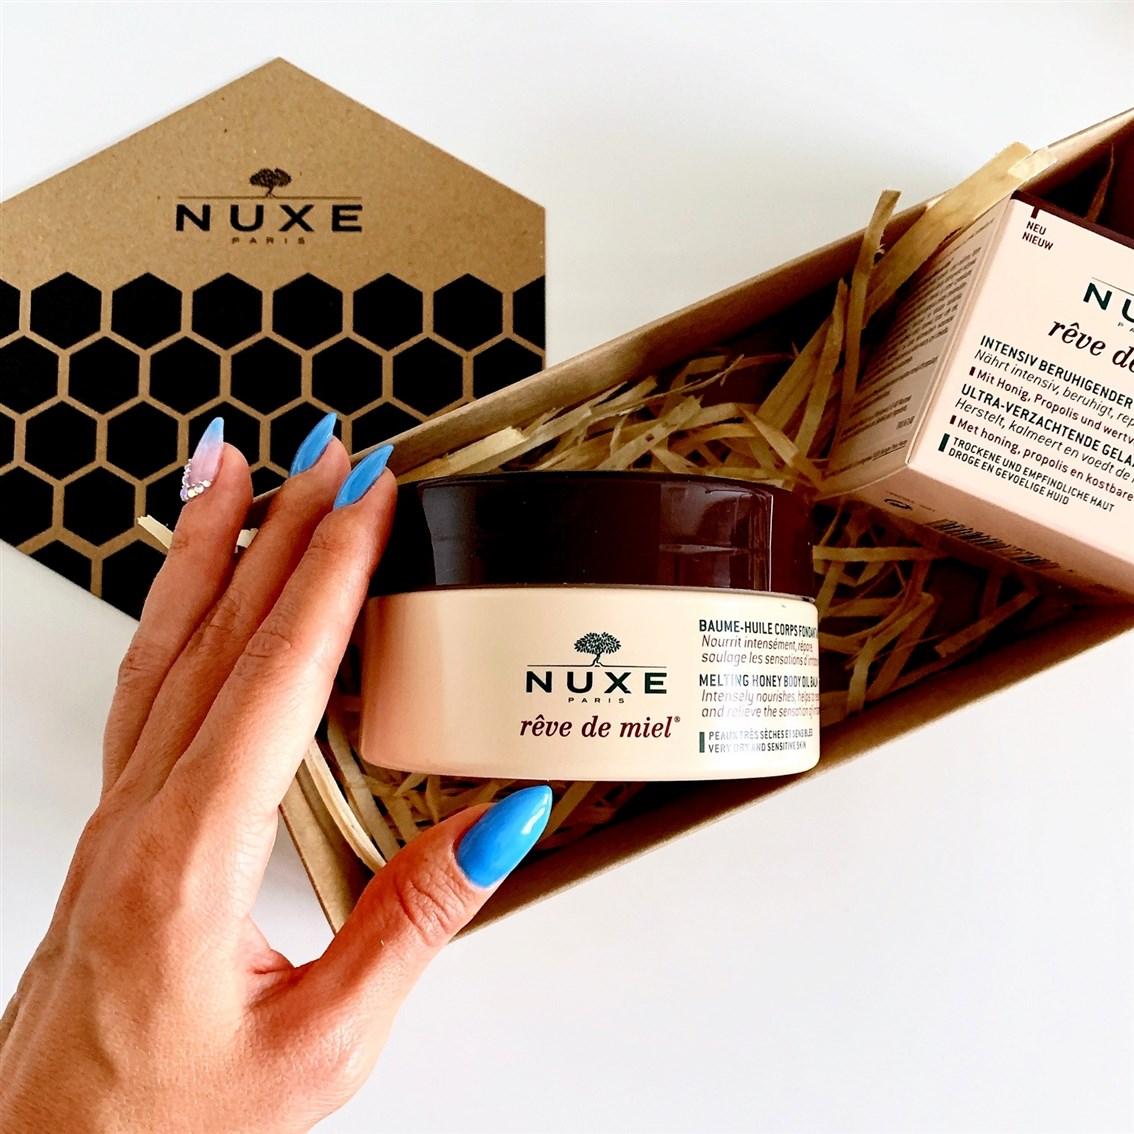 Nuxe Reve de Miel olejkowy balsam do ciała opinie